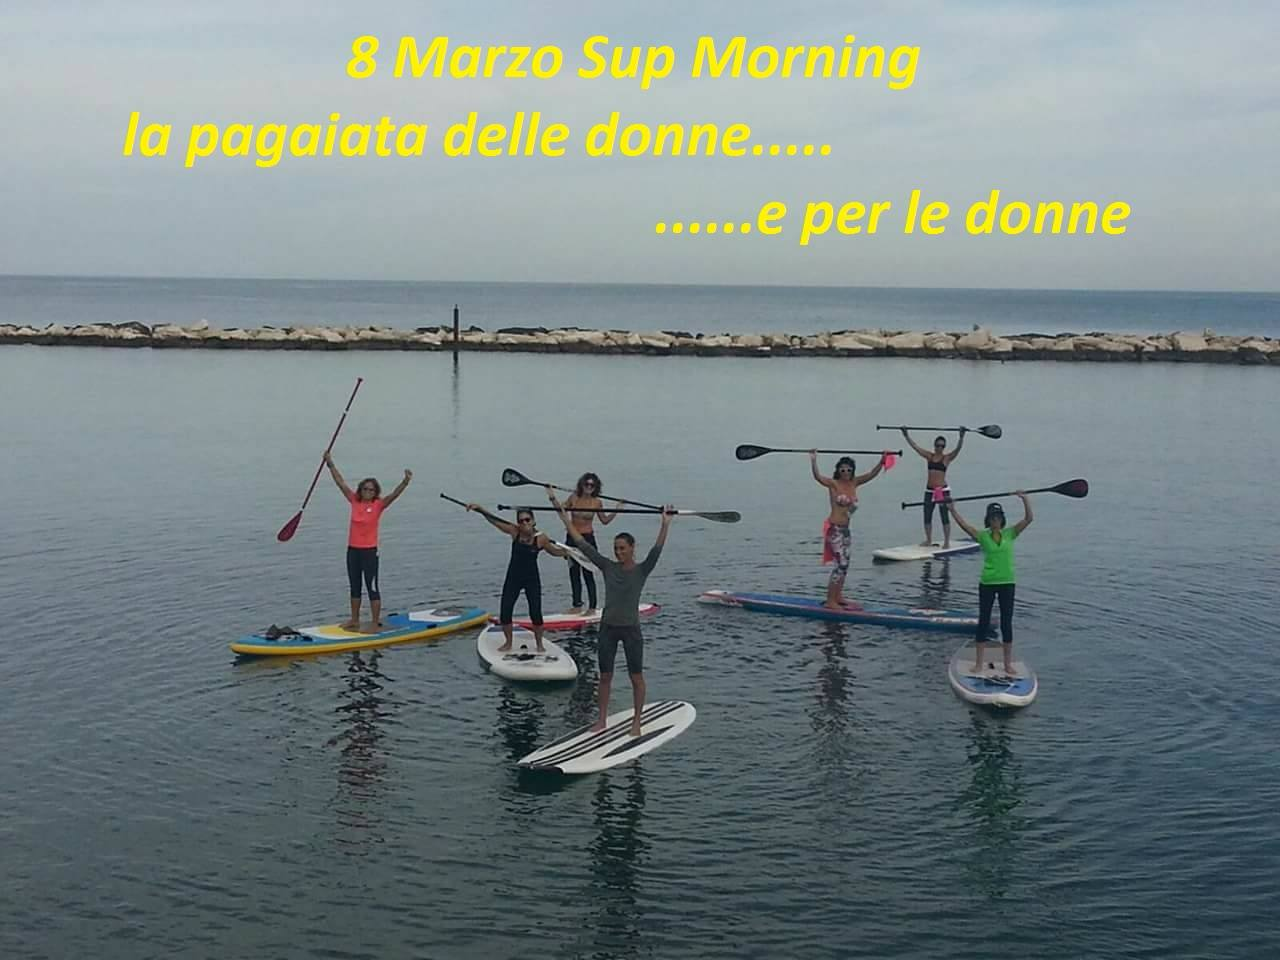 8 marzo sup morning pagaiata donne